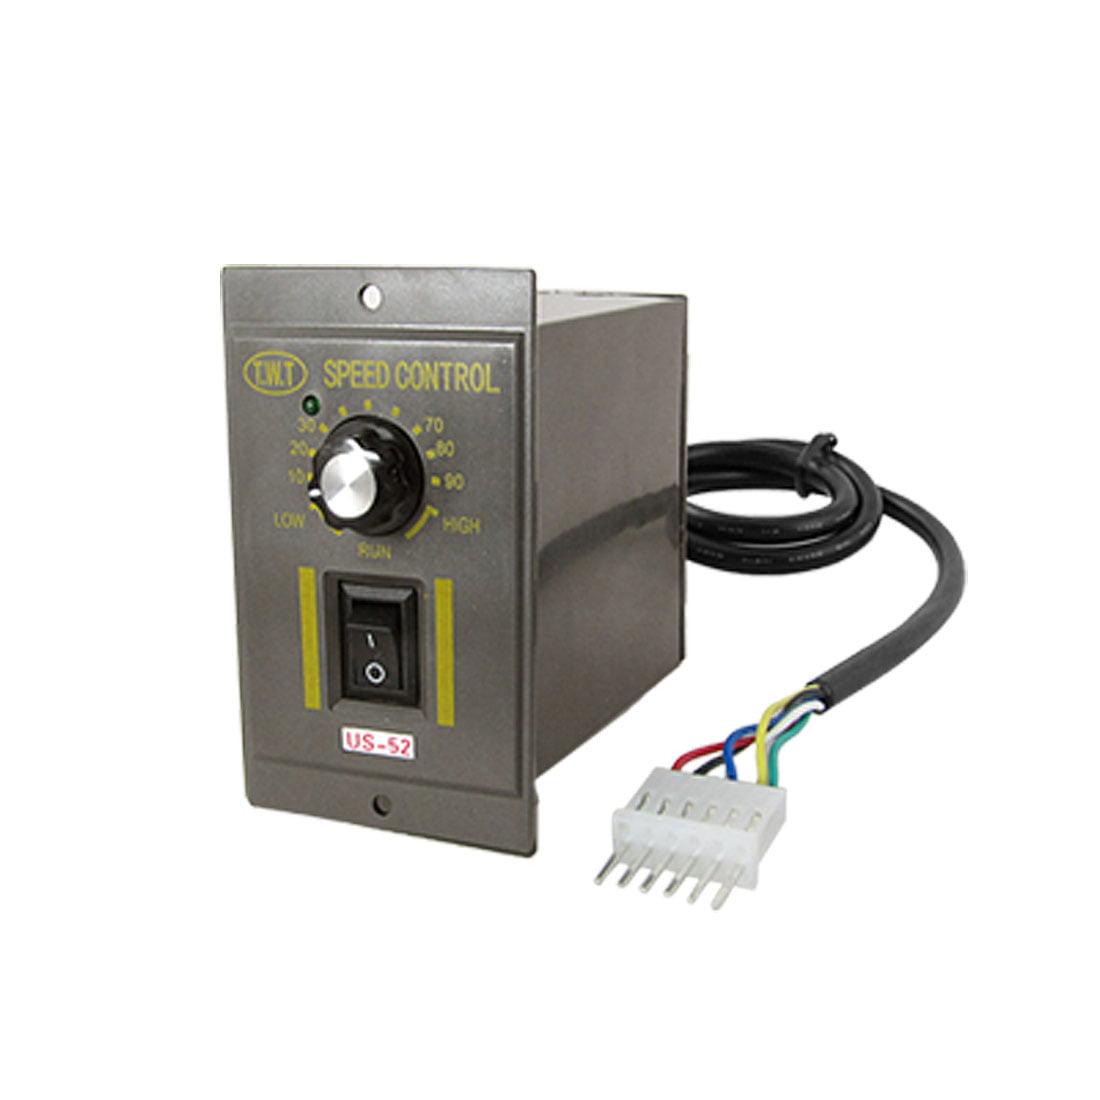 Electric Gear Motor Speed Controller US-52 120W AC 220V - Walmart.com